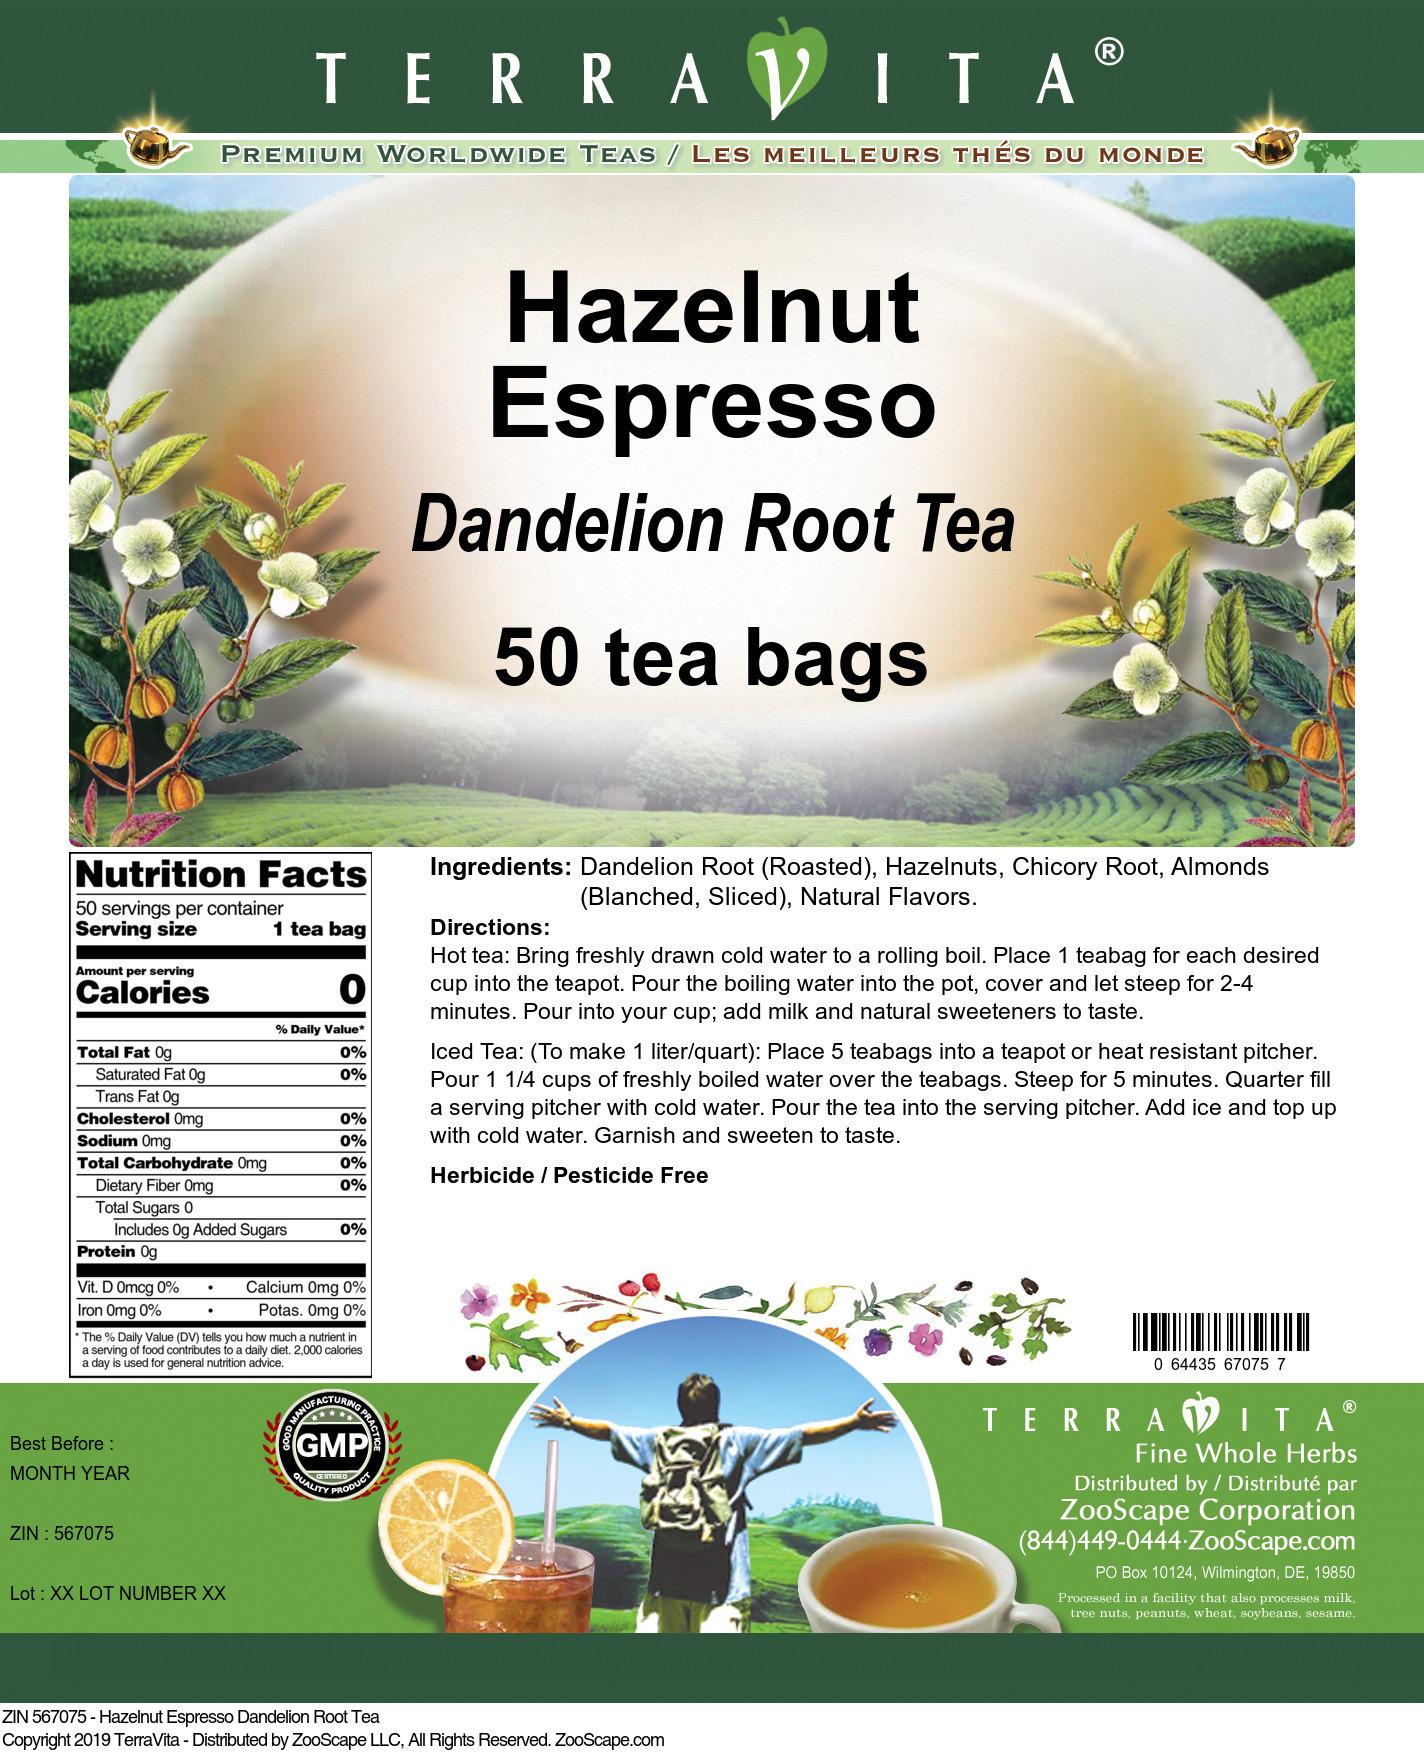 Hazelnut Espresso Dandelion Root Tea